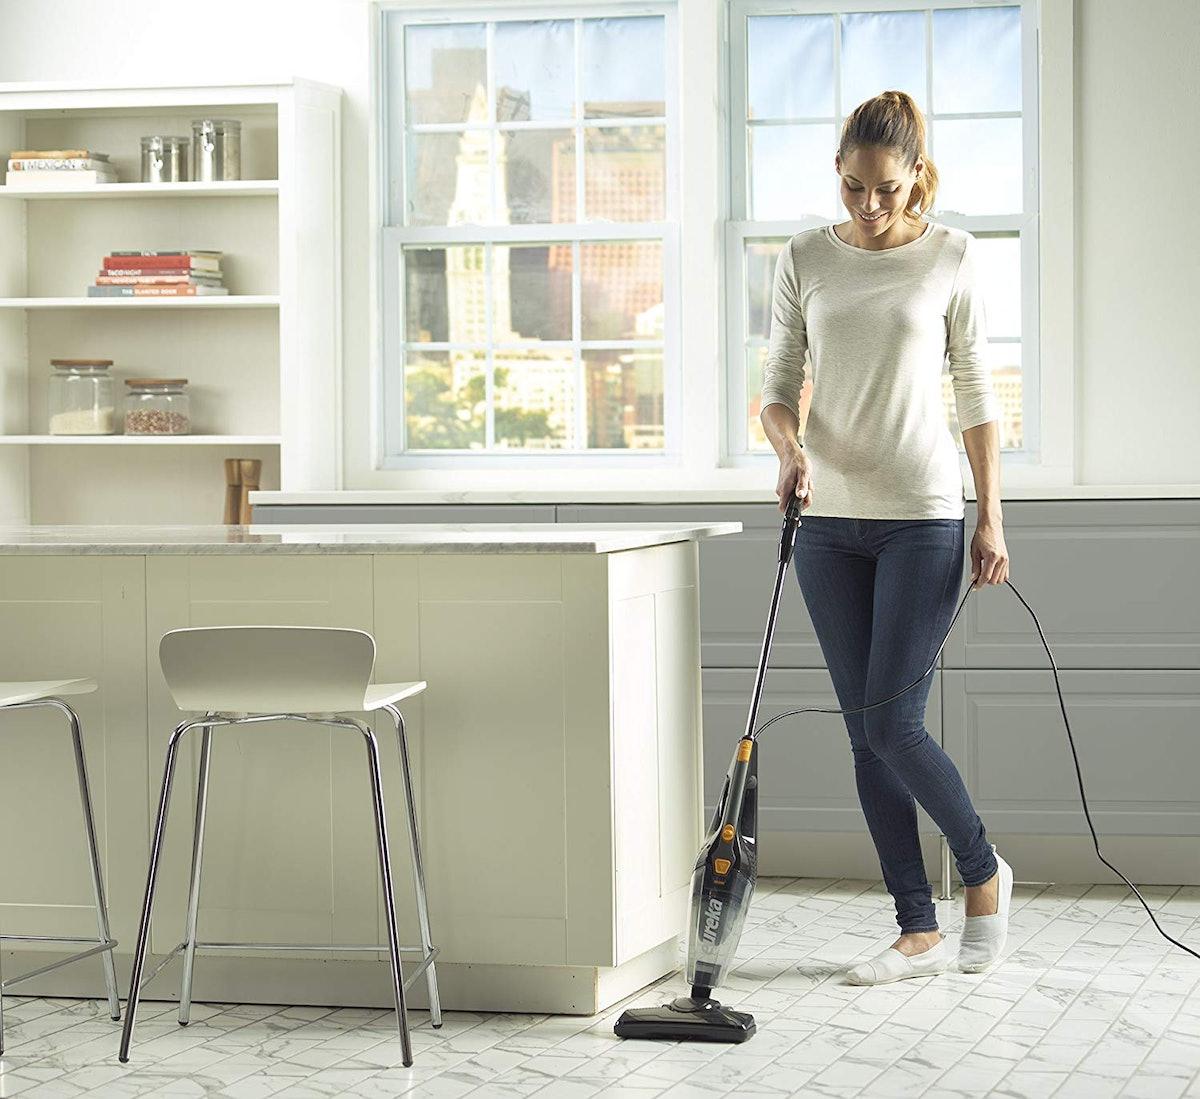 Eureka Blaze Three-In-One Swivel Vacuum